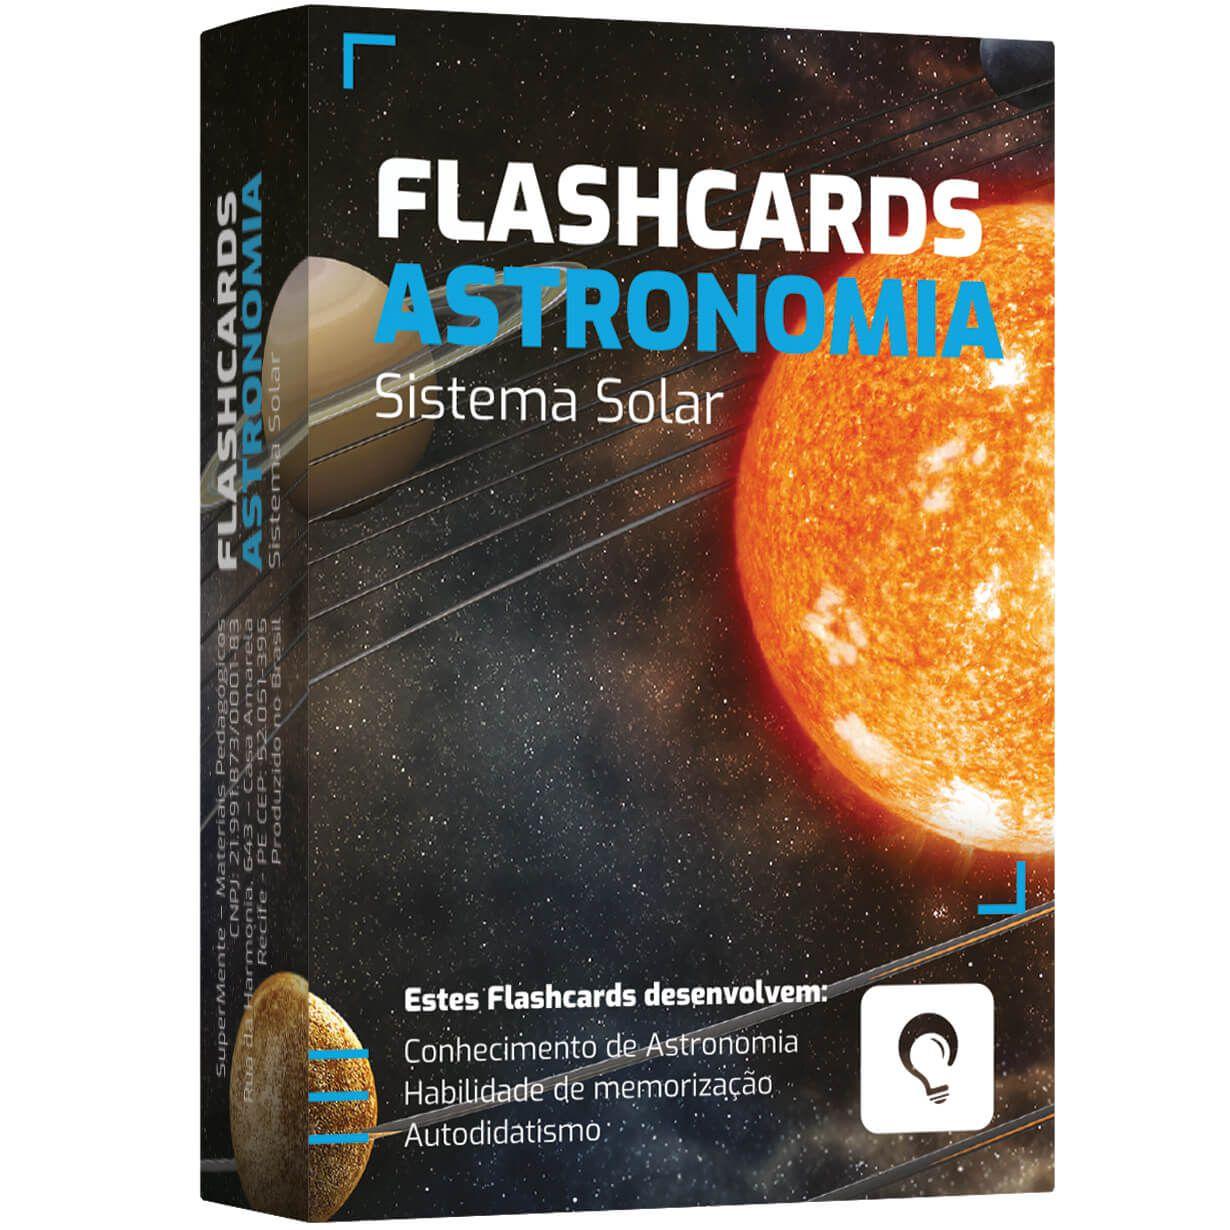 Flashcards Astronomia